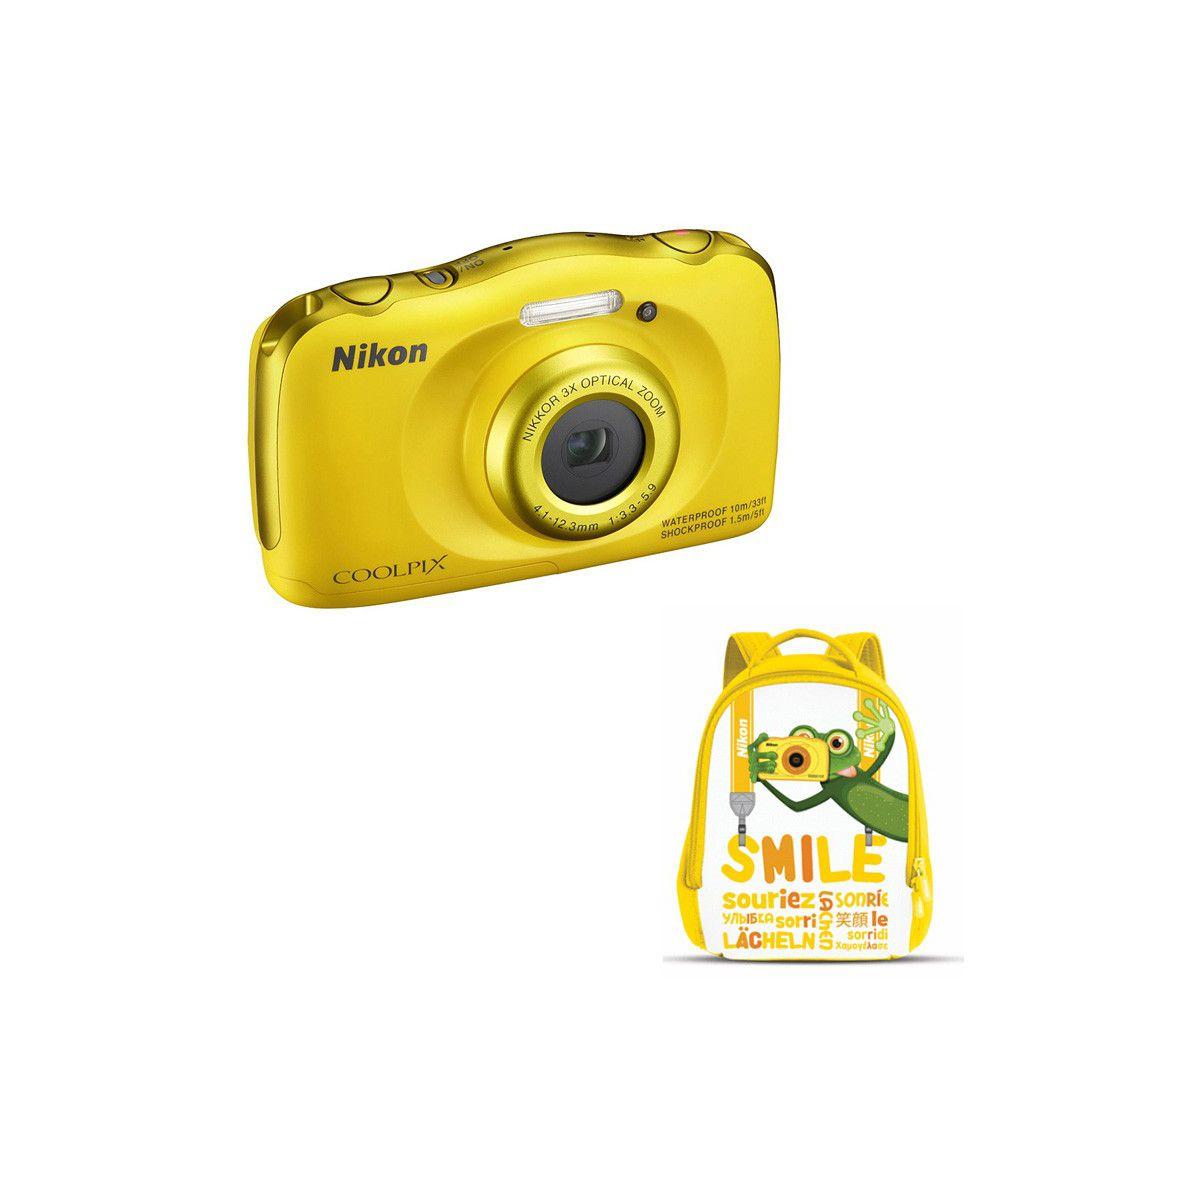 Appareil photo Compact NIKON Coolpix W100 Jaune + Sac à dos